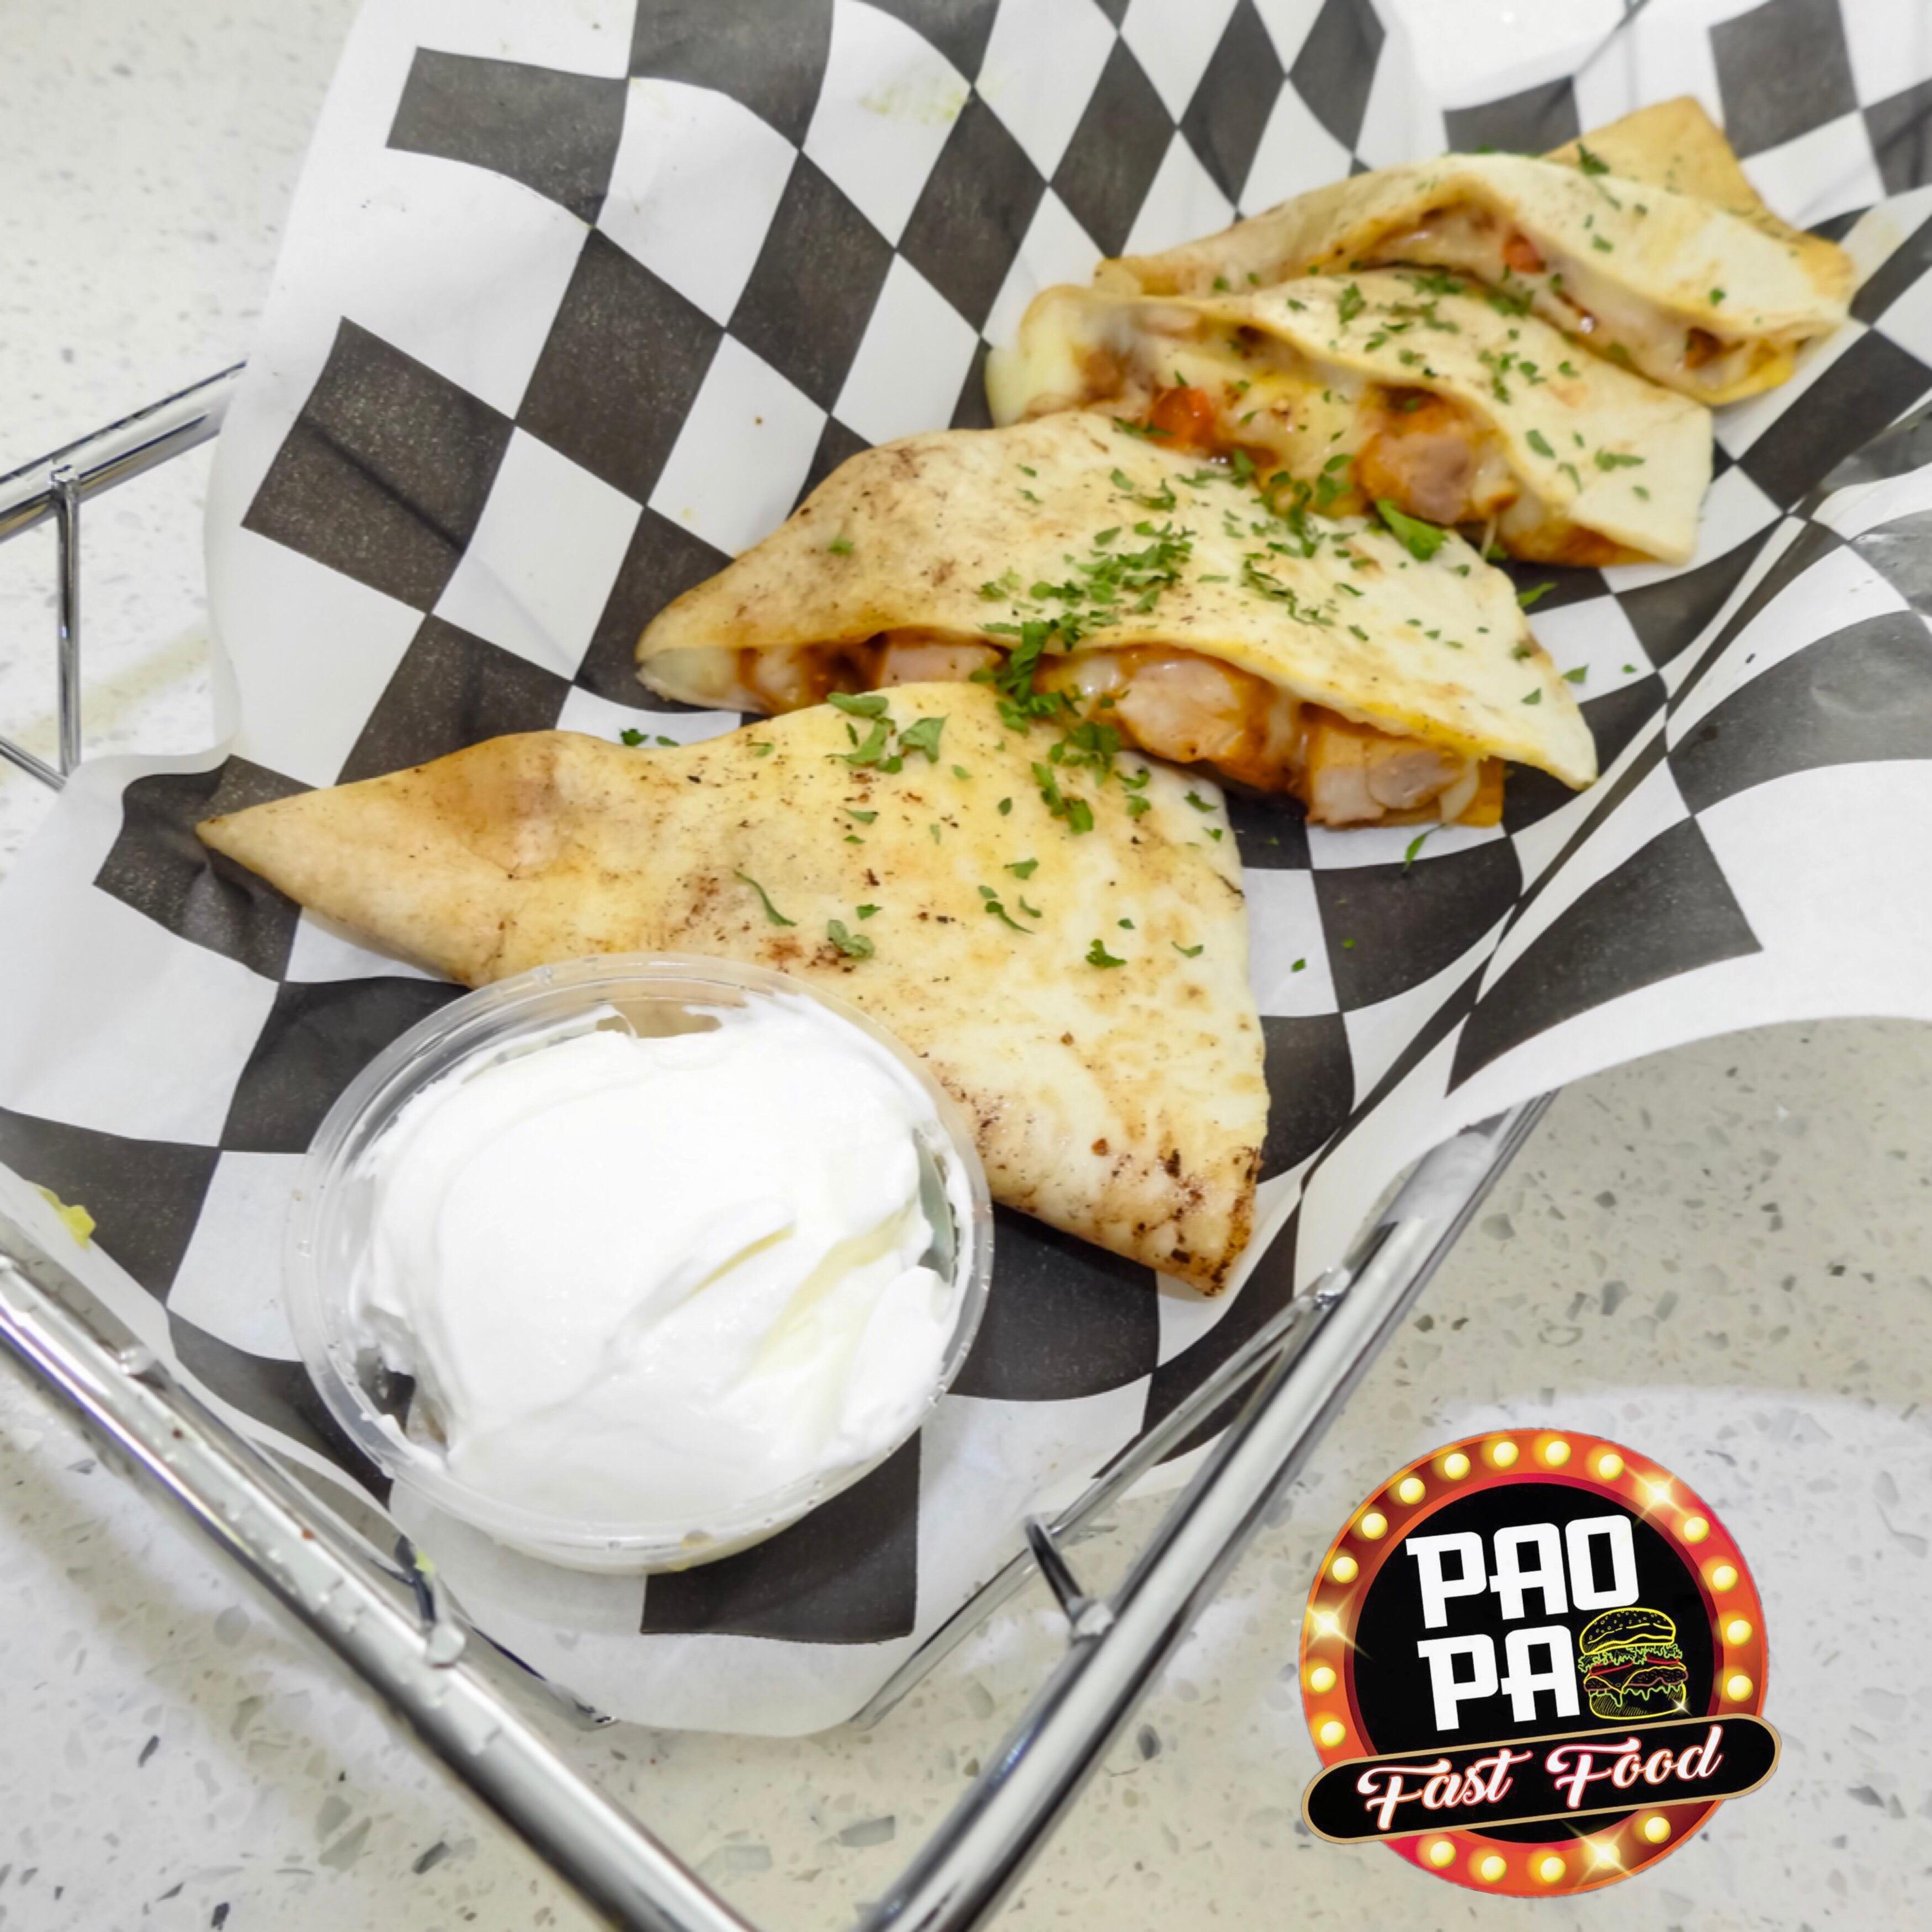 Pao Pao Fast Food image 1